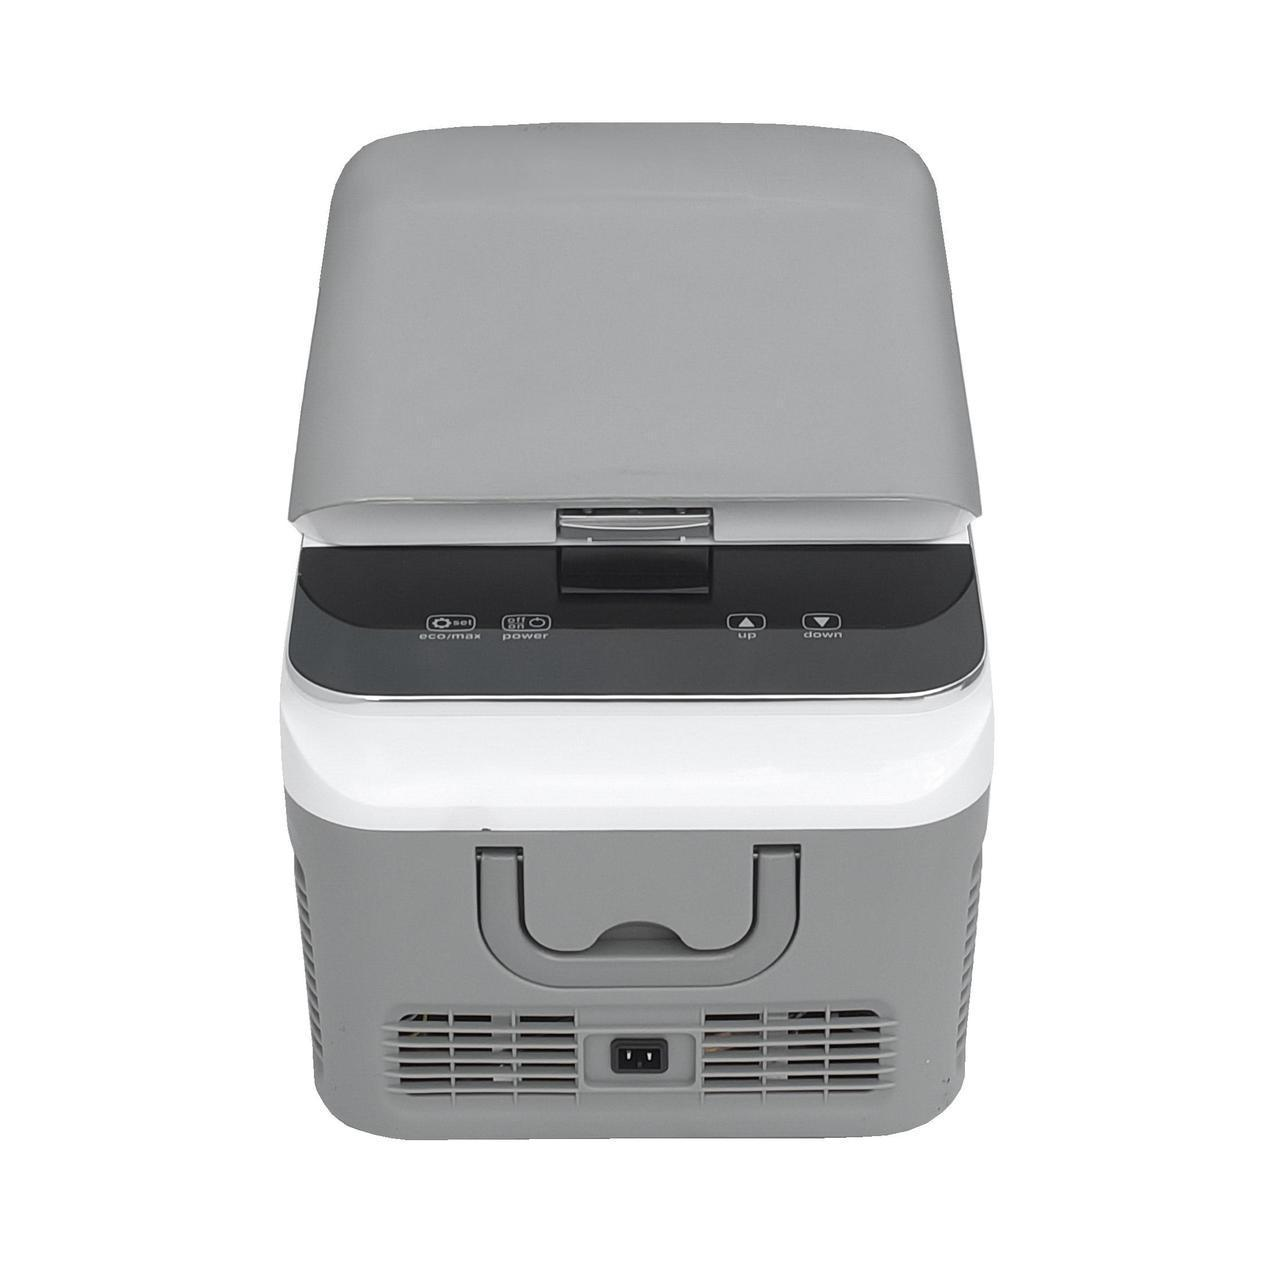 Портативная морозильная камера холодильник Dowell BCD-20